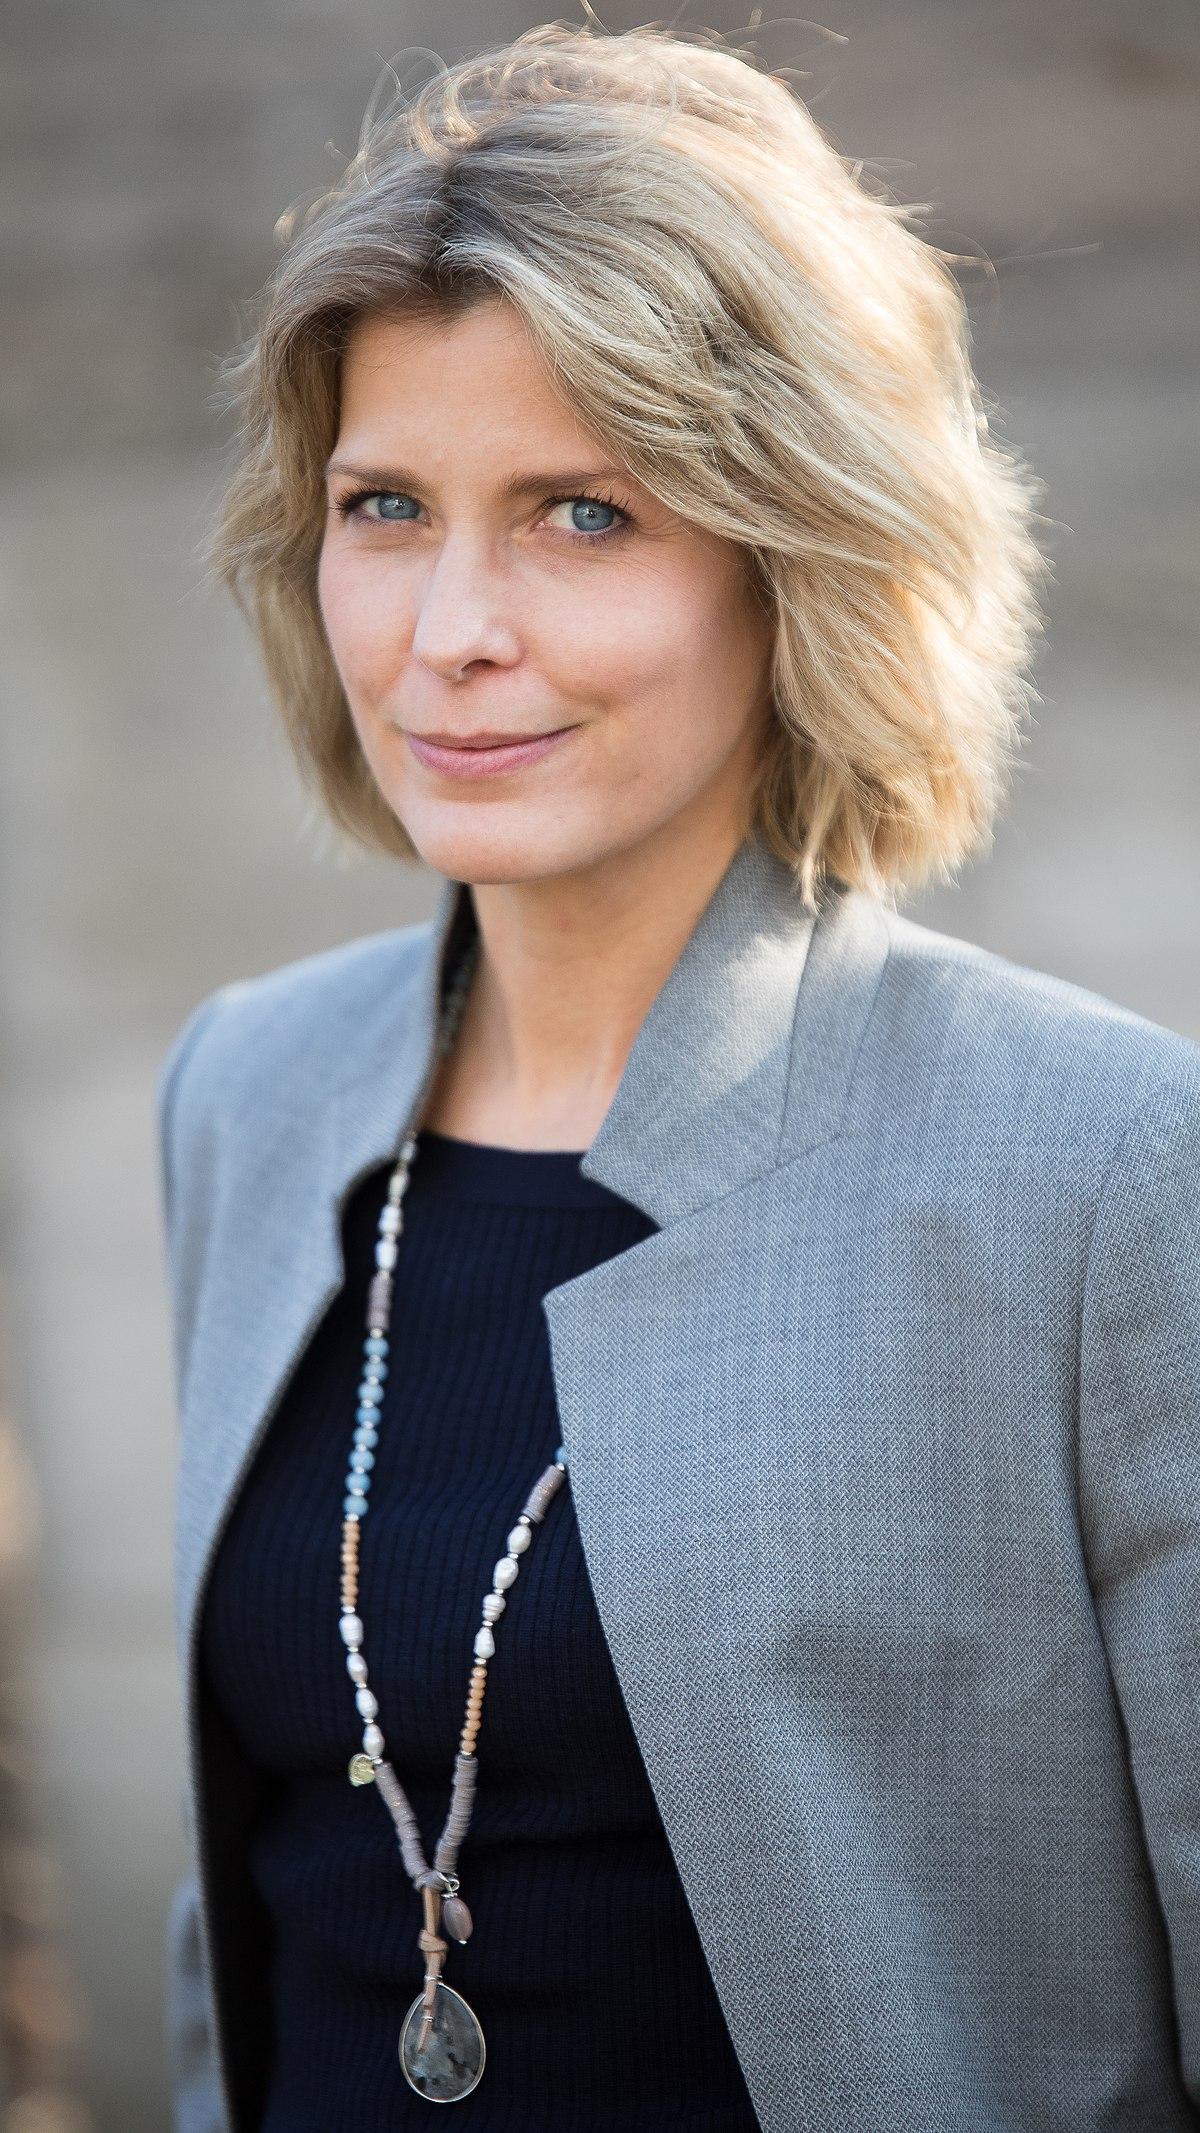 Valerie Niehaus - Wikipedia